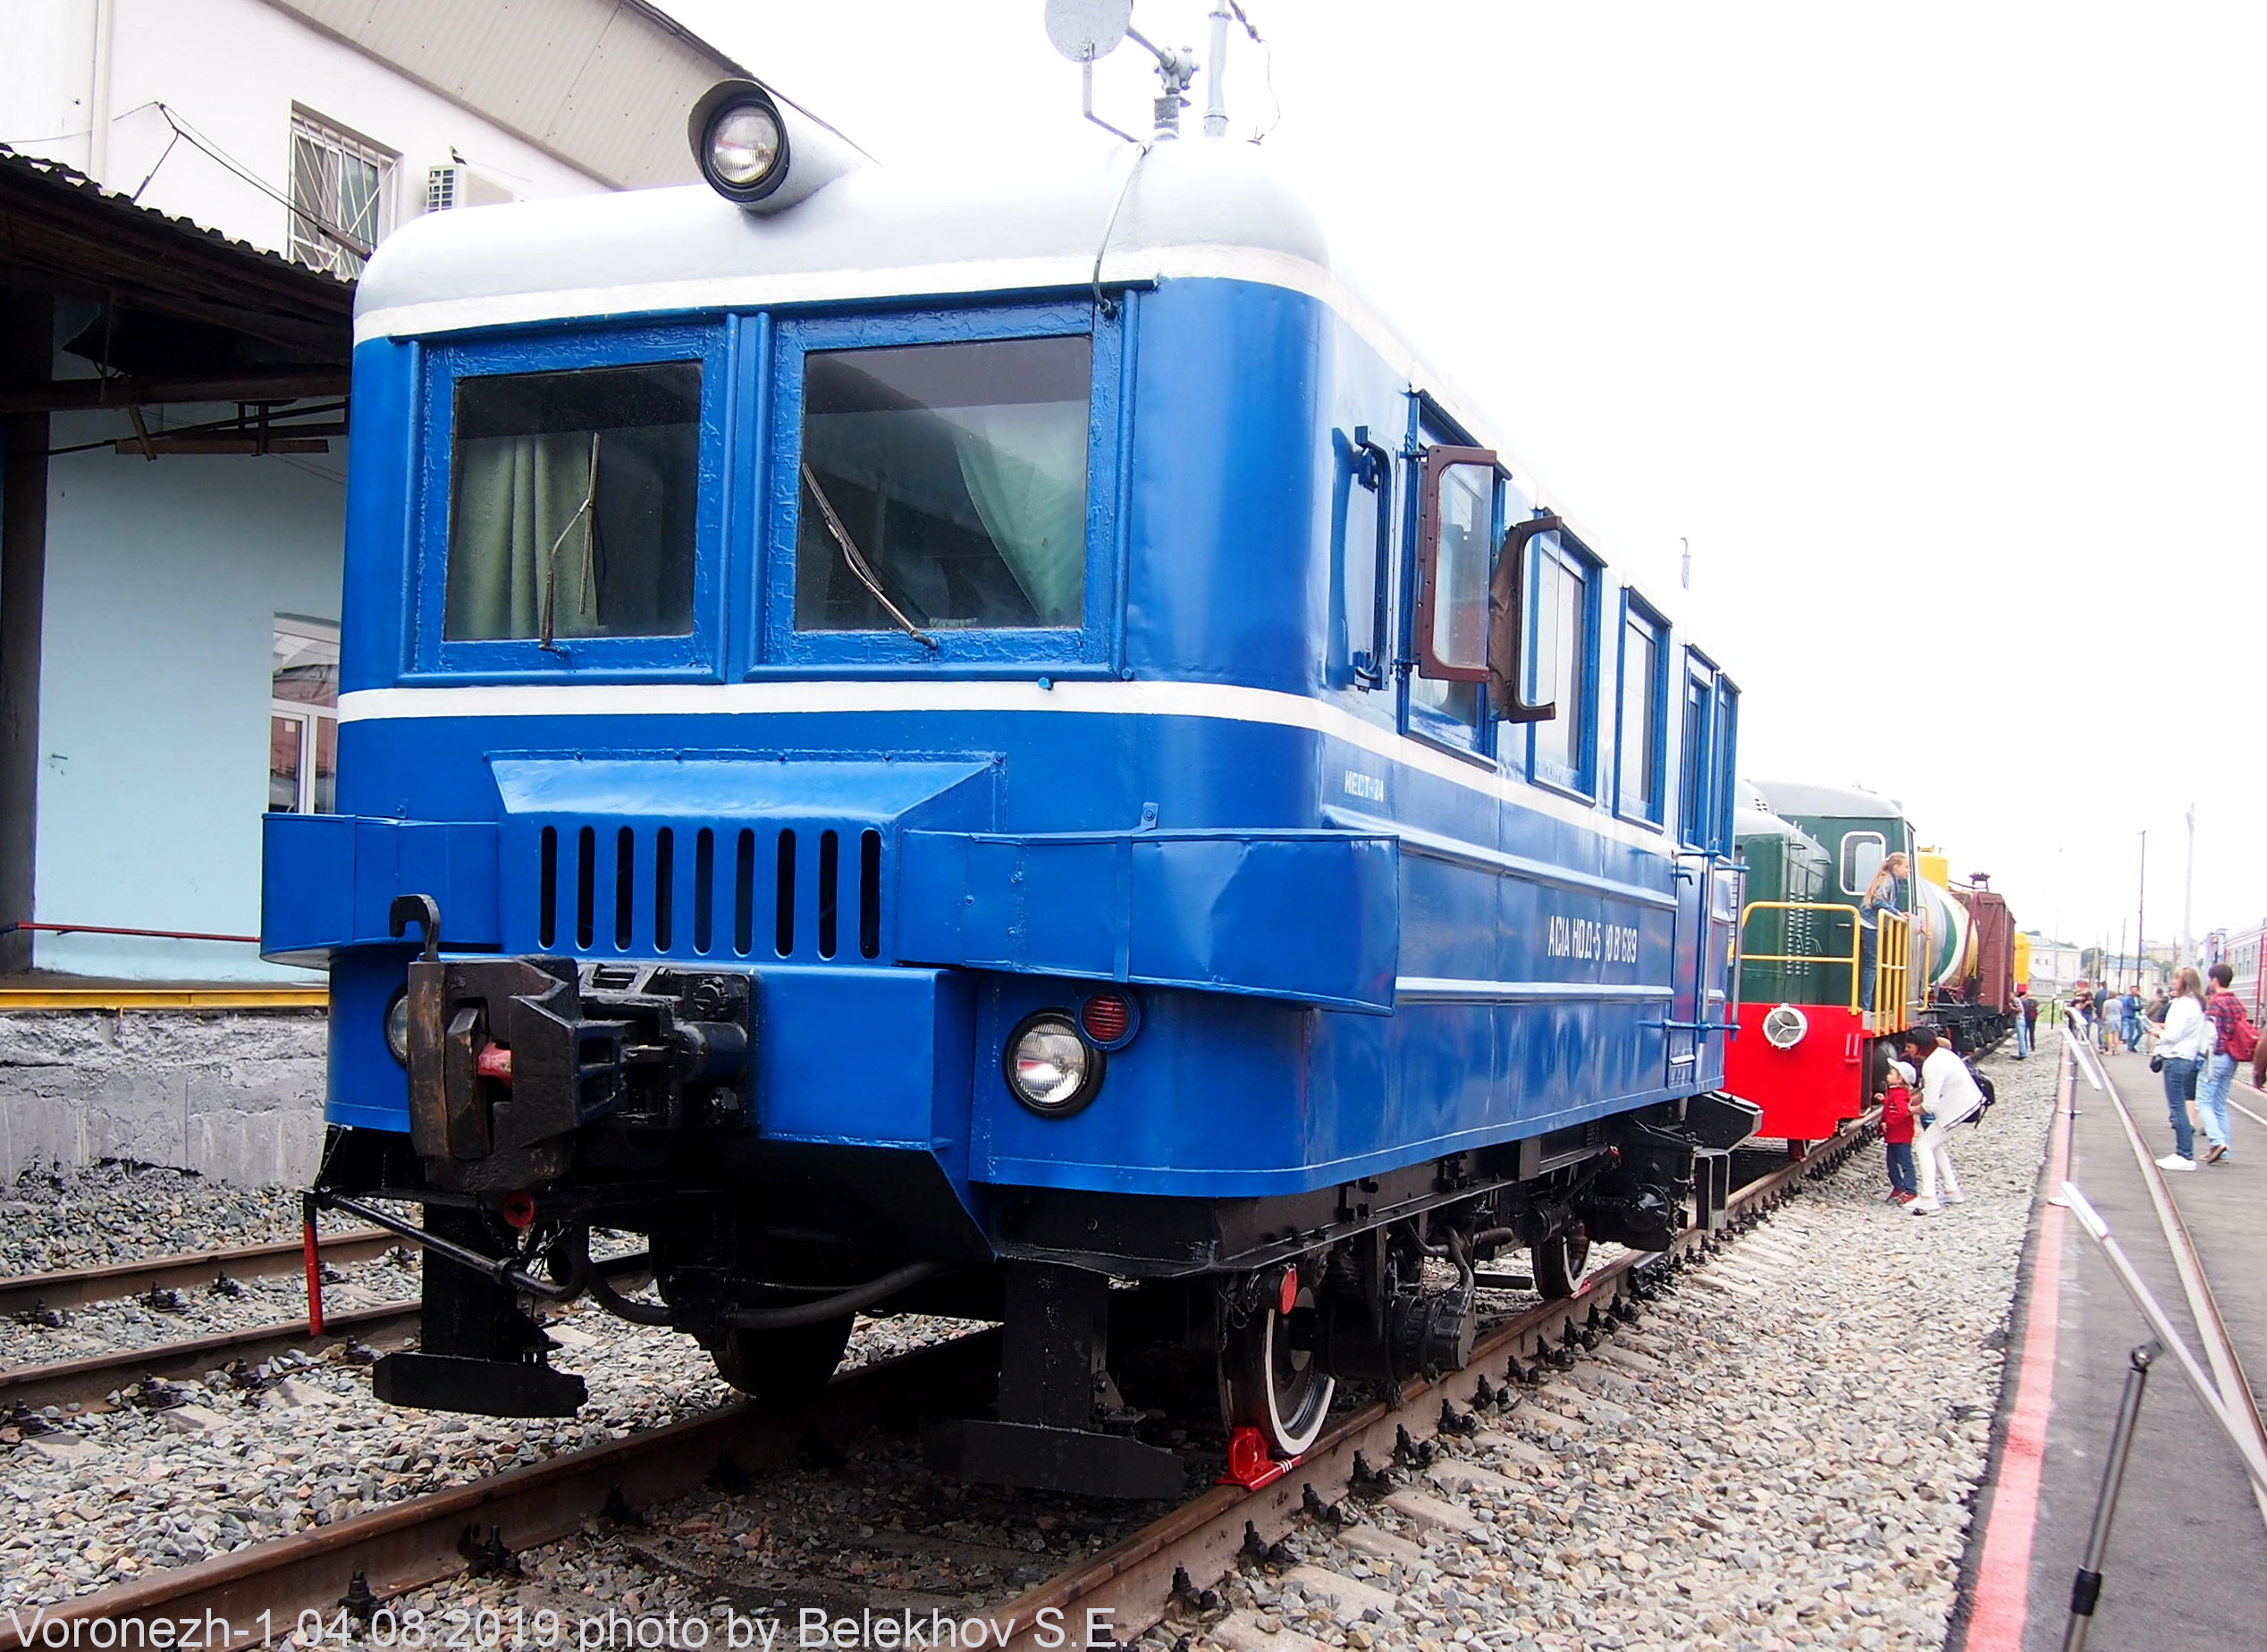 Воронеж, железная дорога, ретро-поезда